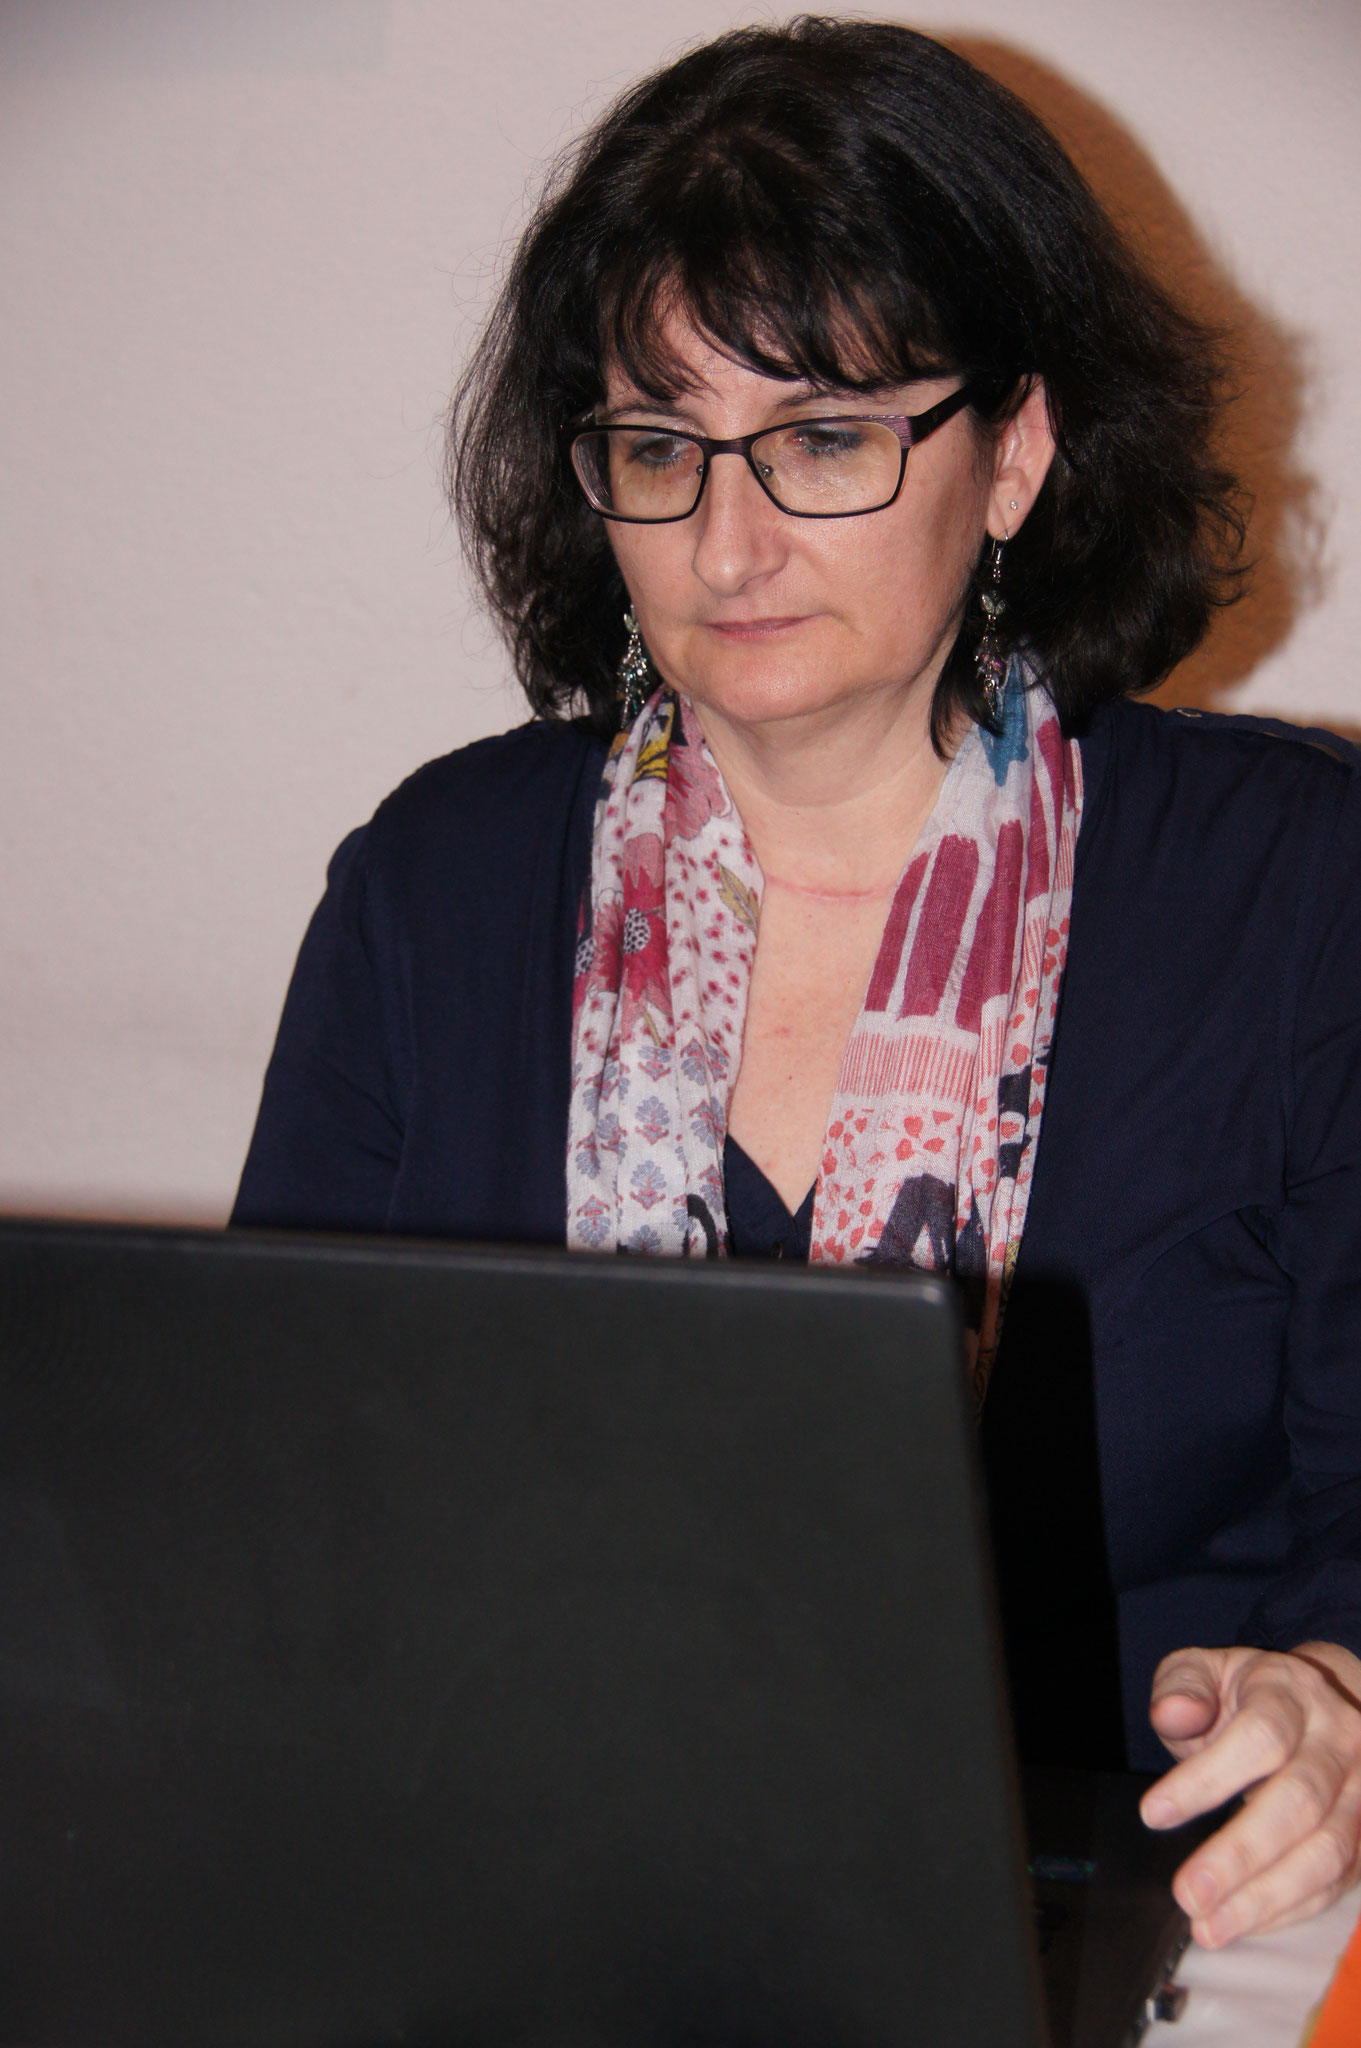 Aktuarin/Sekretärin Karin Ammann am Schreiben des Protokolls